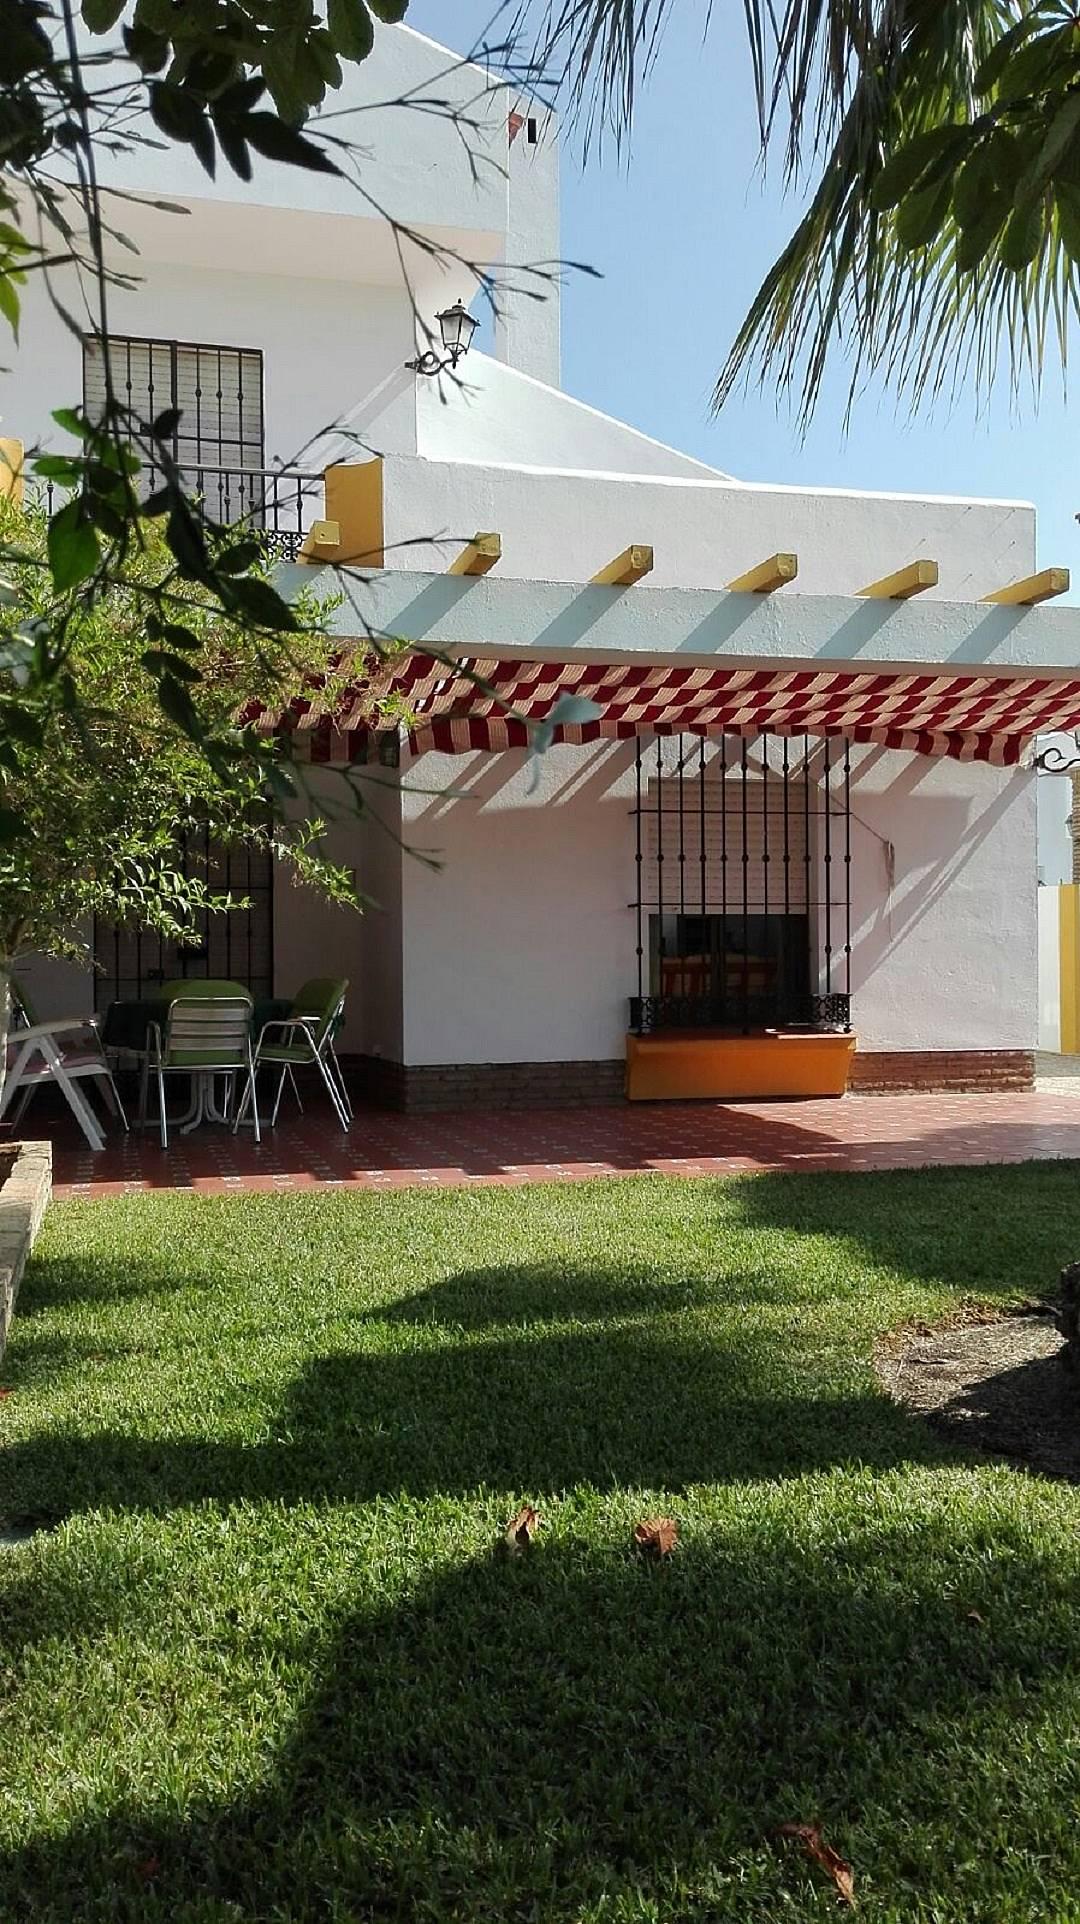 Alquiler de casas vacacionales en mazagon moguer rurales chalets bungalows - Alquiler casa mazagon ...